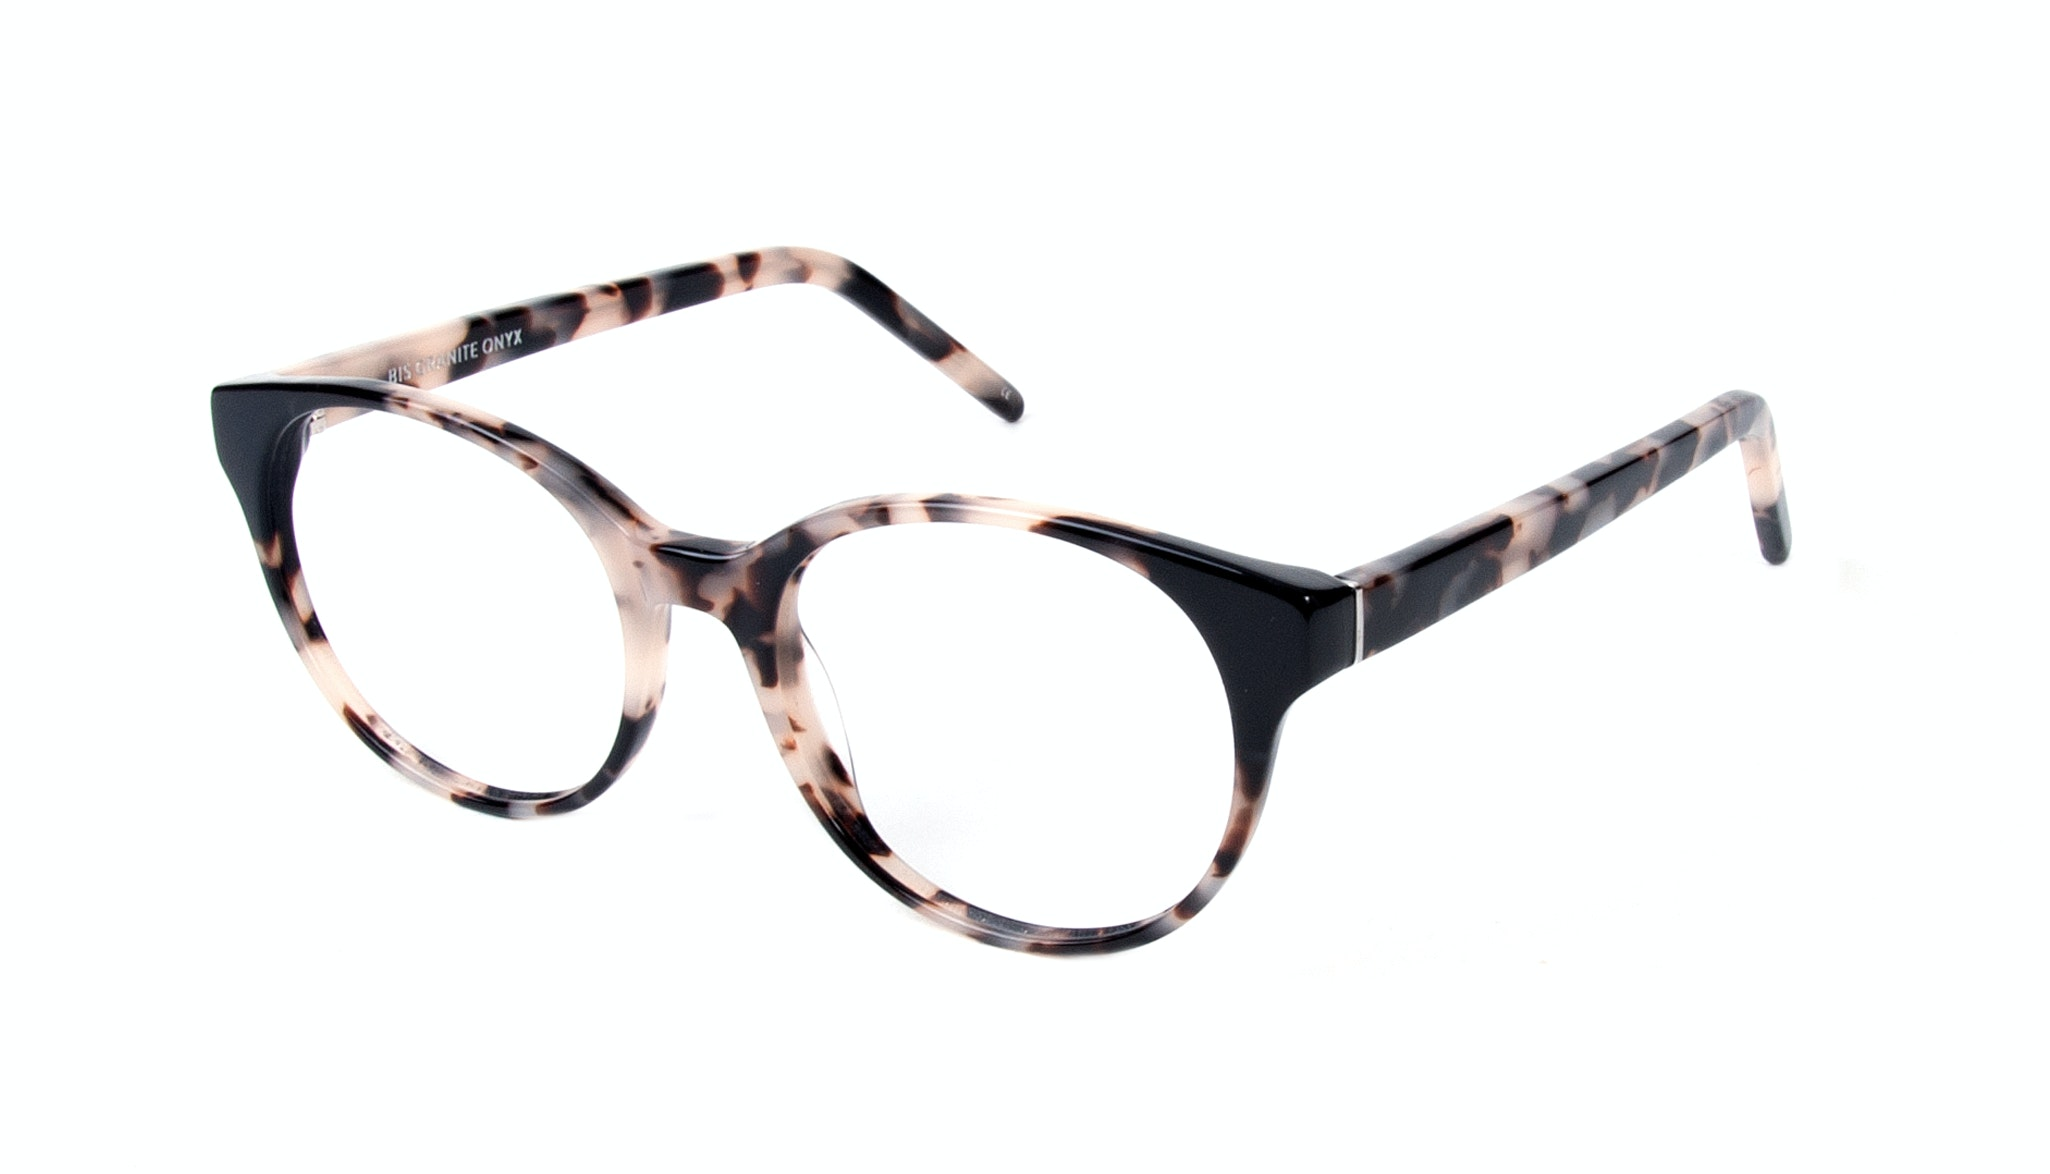 Affordable Fashion Glasses Round Eyeglasses Women Bis Granite Onyx Tilt